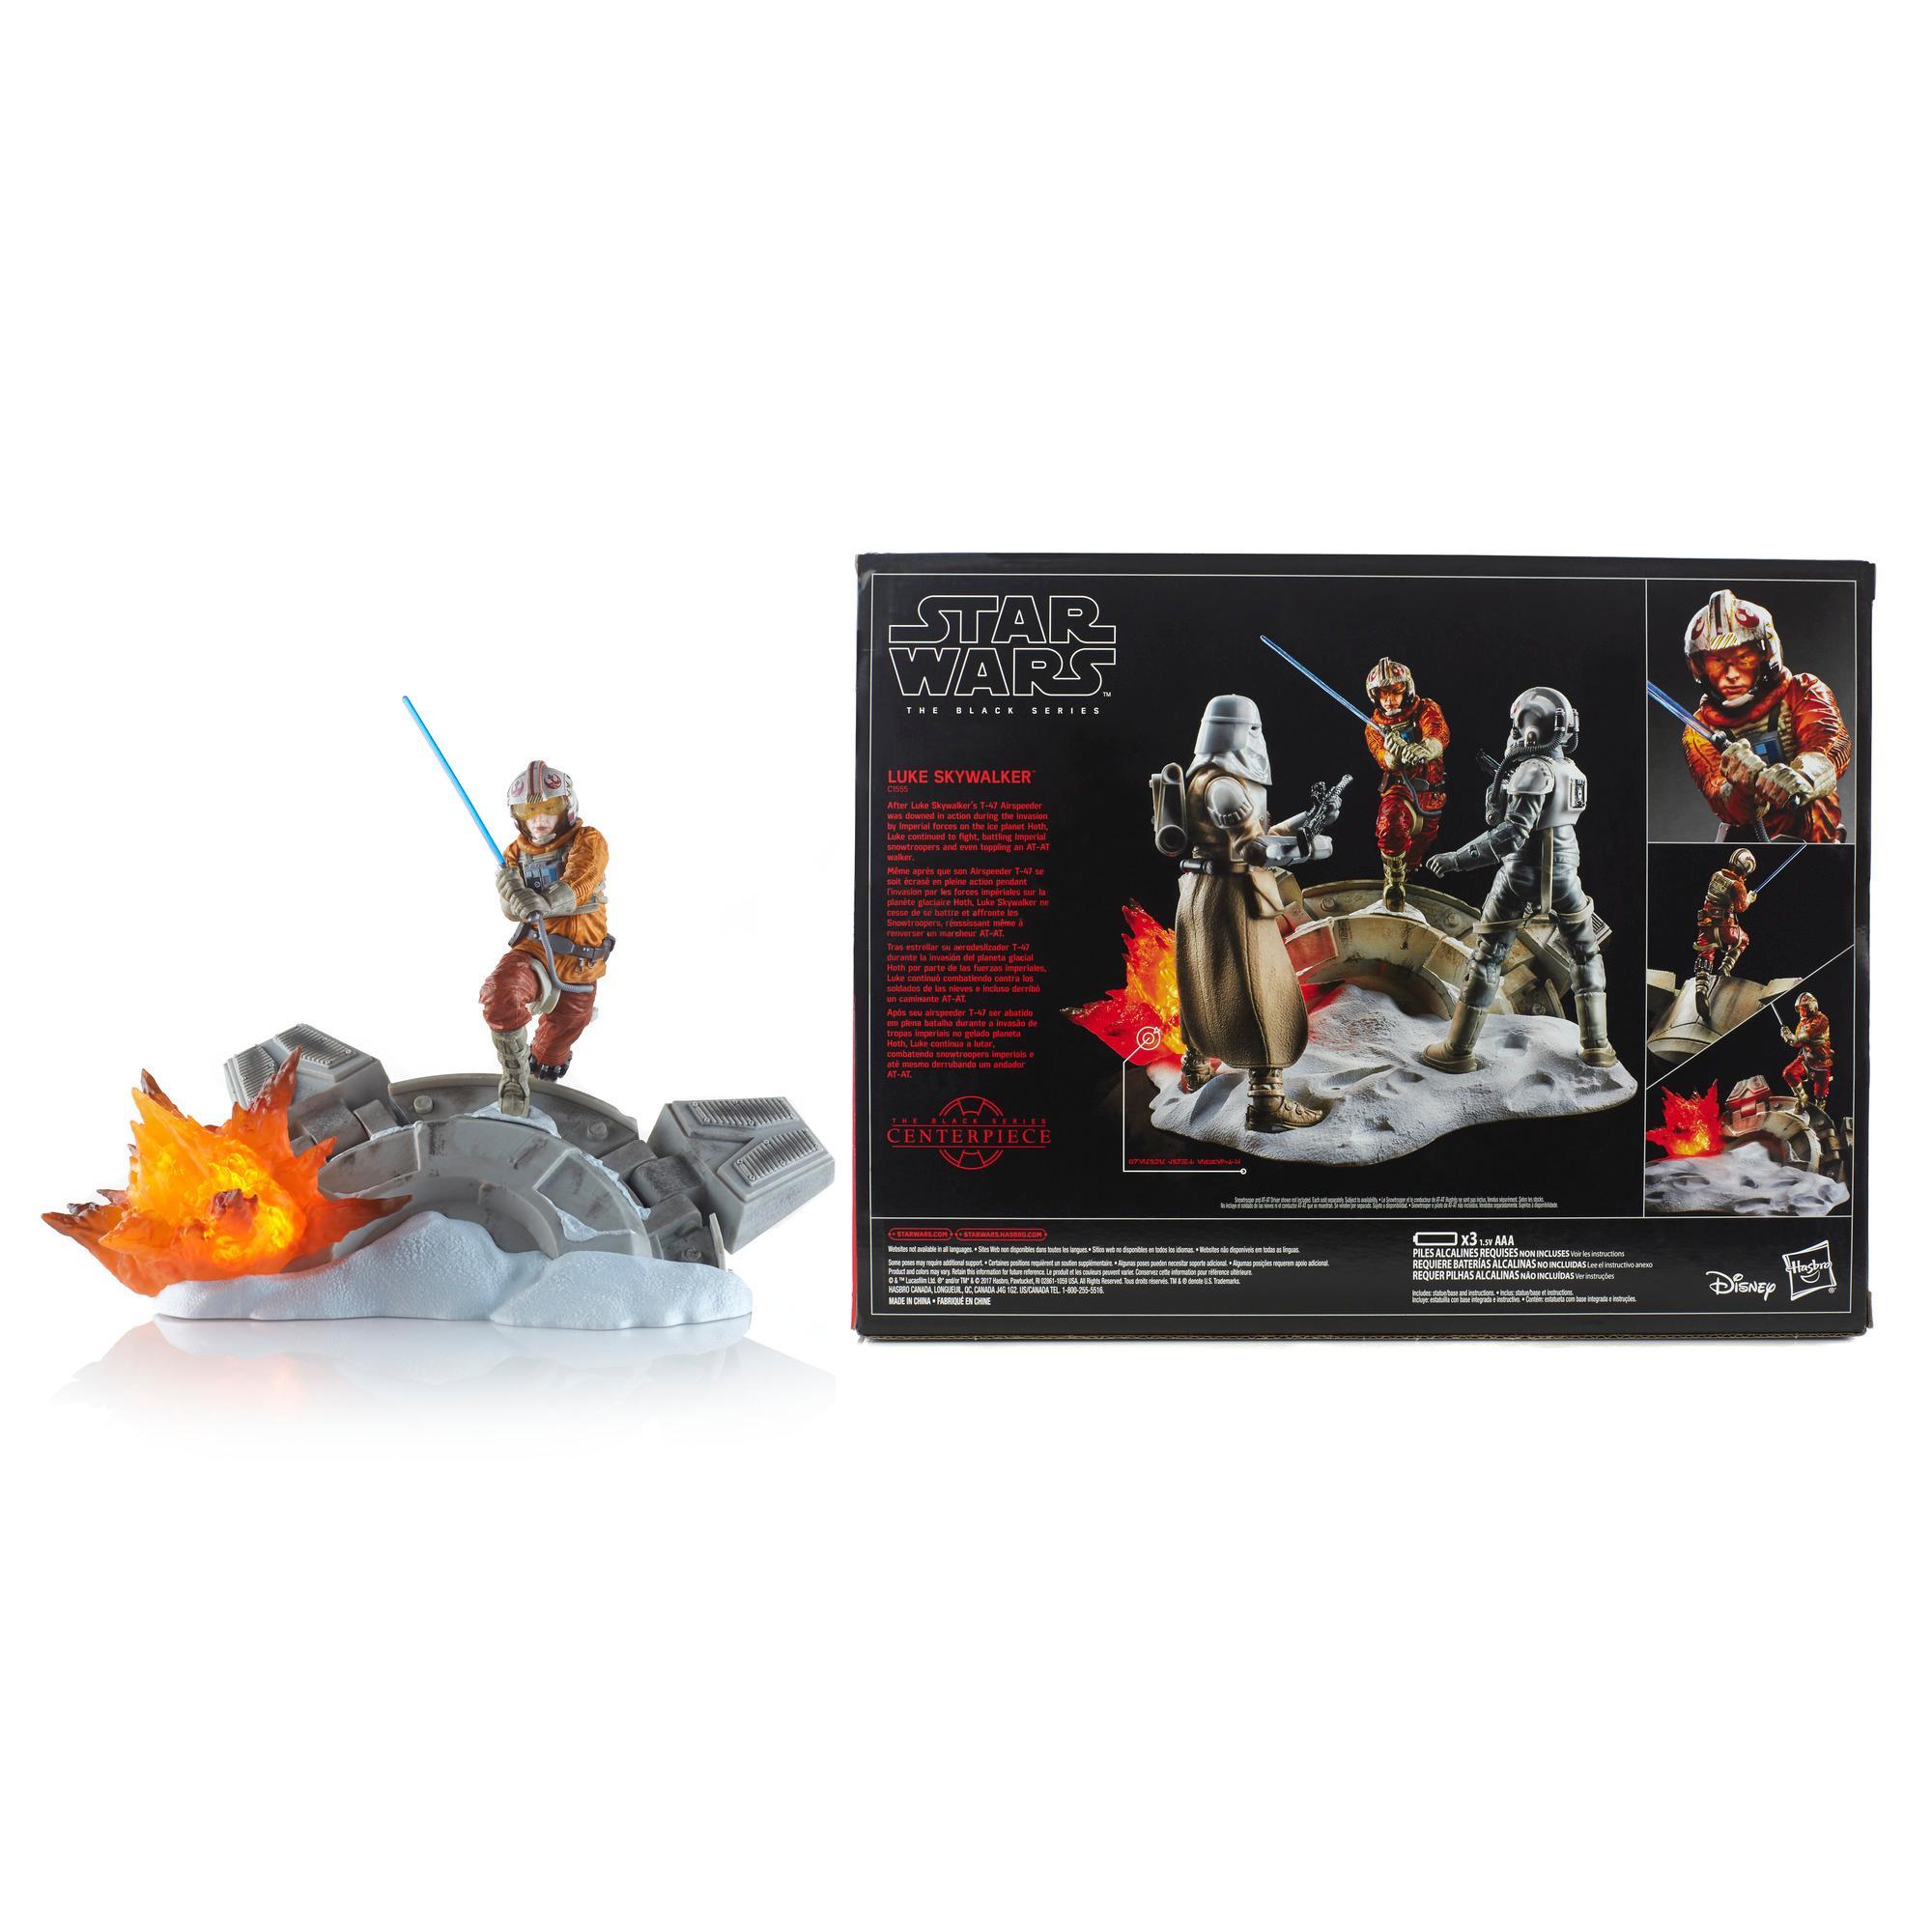 Star Wars The Black Series Centerpiece Luke Skywalker